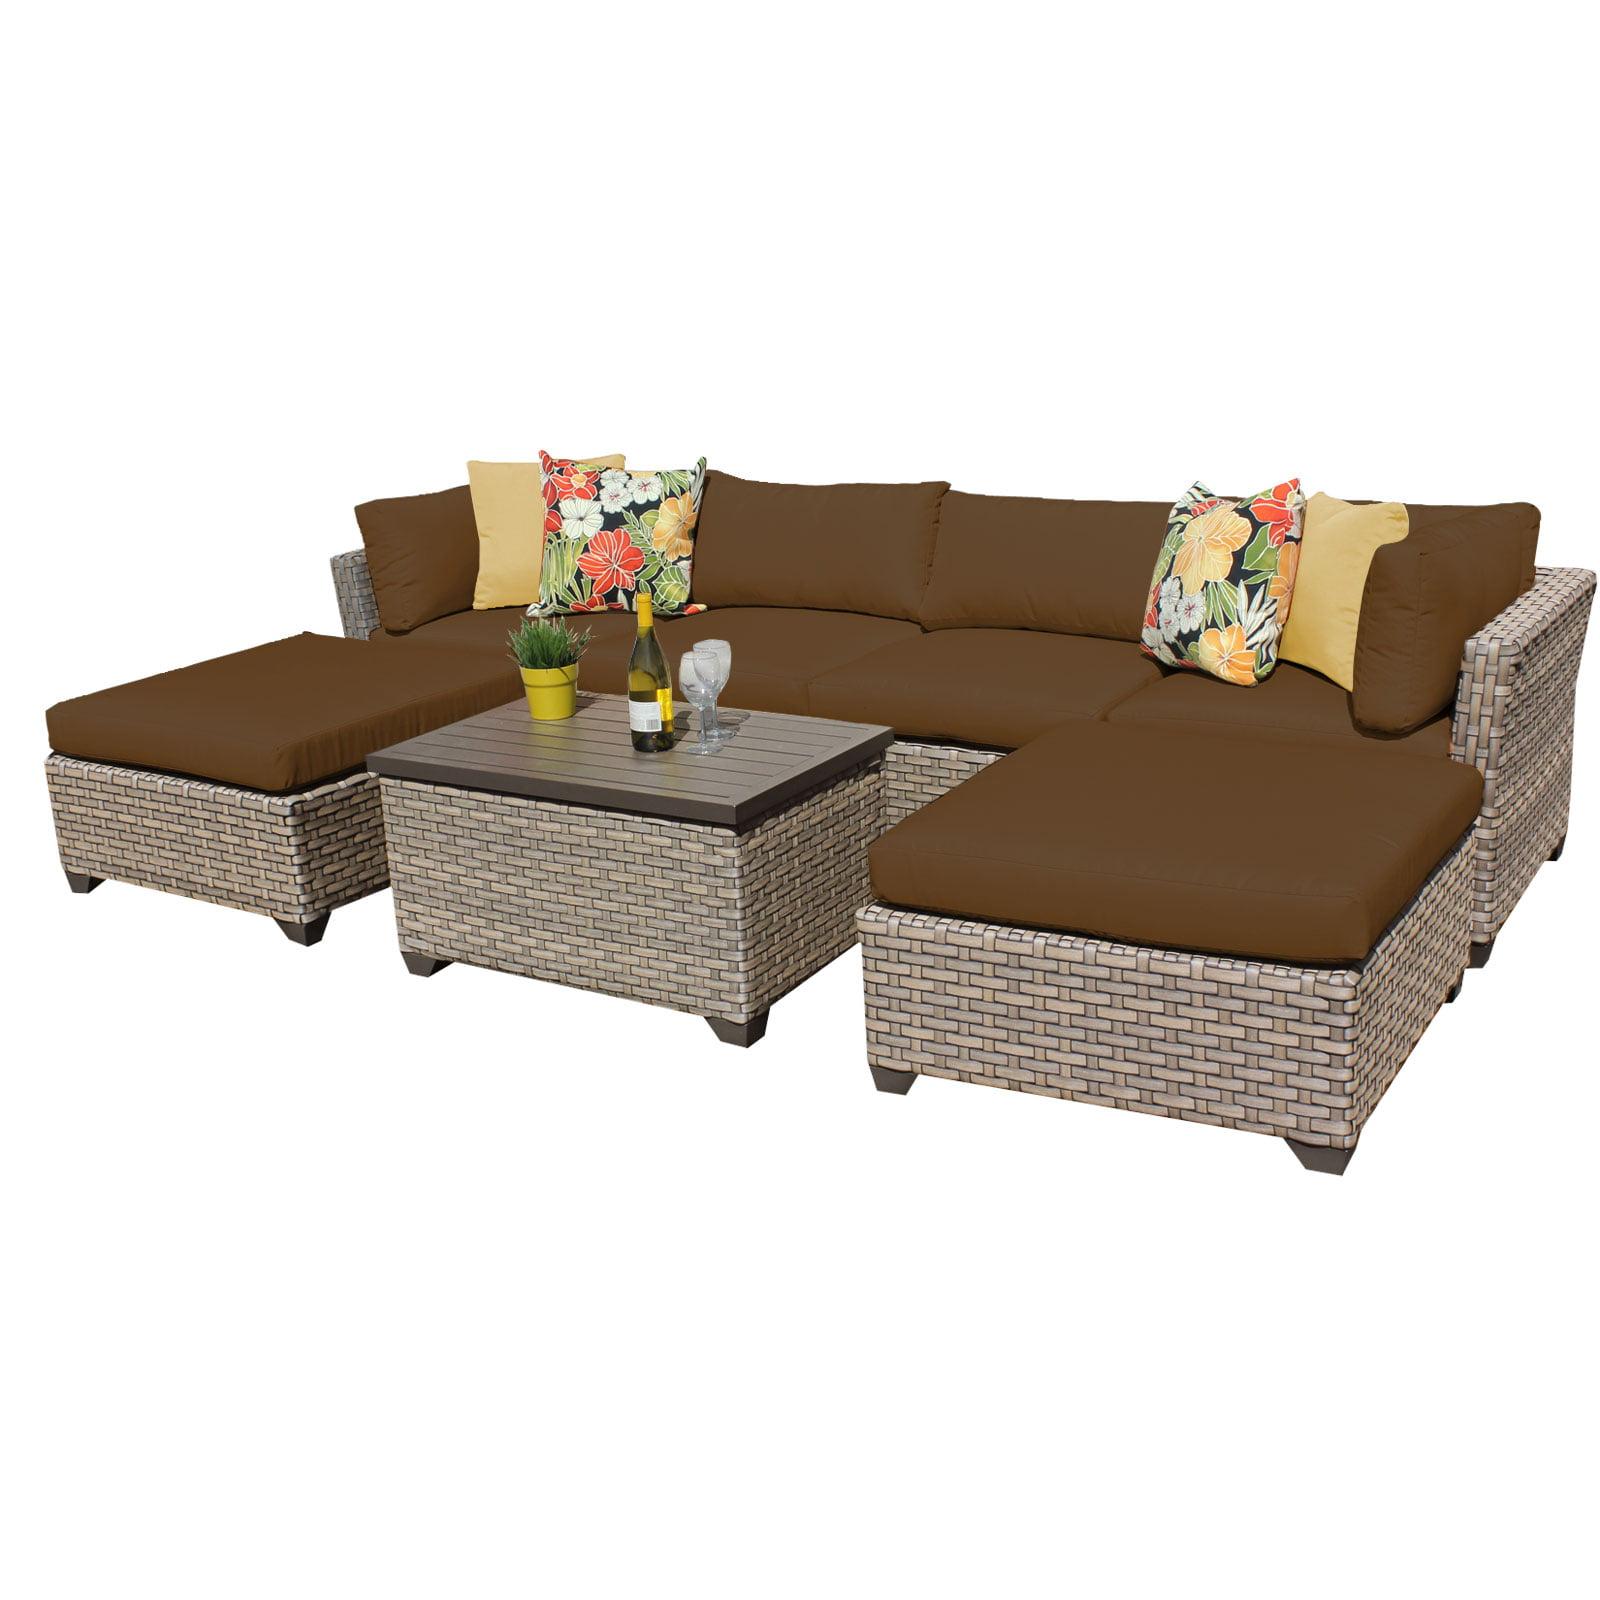 Hampton 7 Piece Outdoor Wicker Patio Furniture Set 07b - Walmart.com